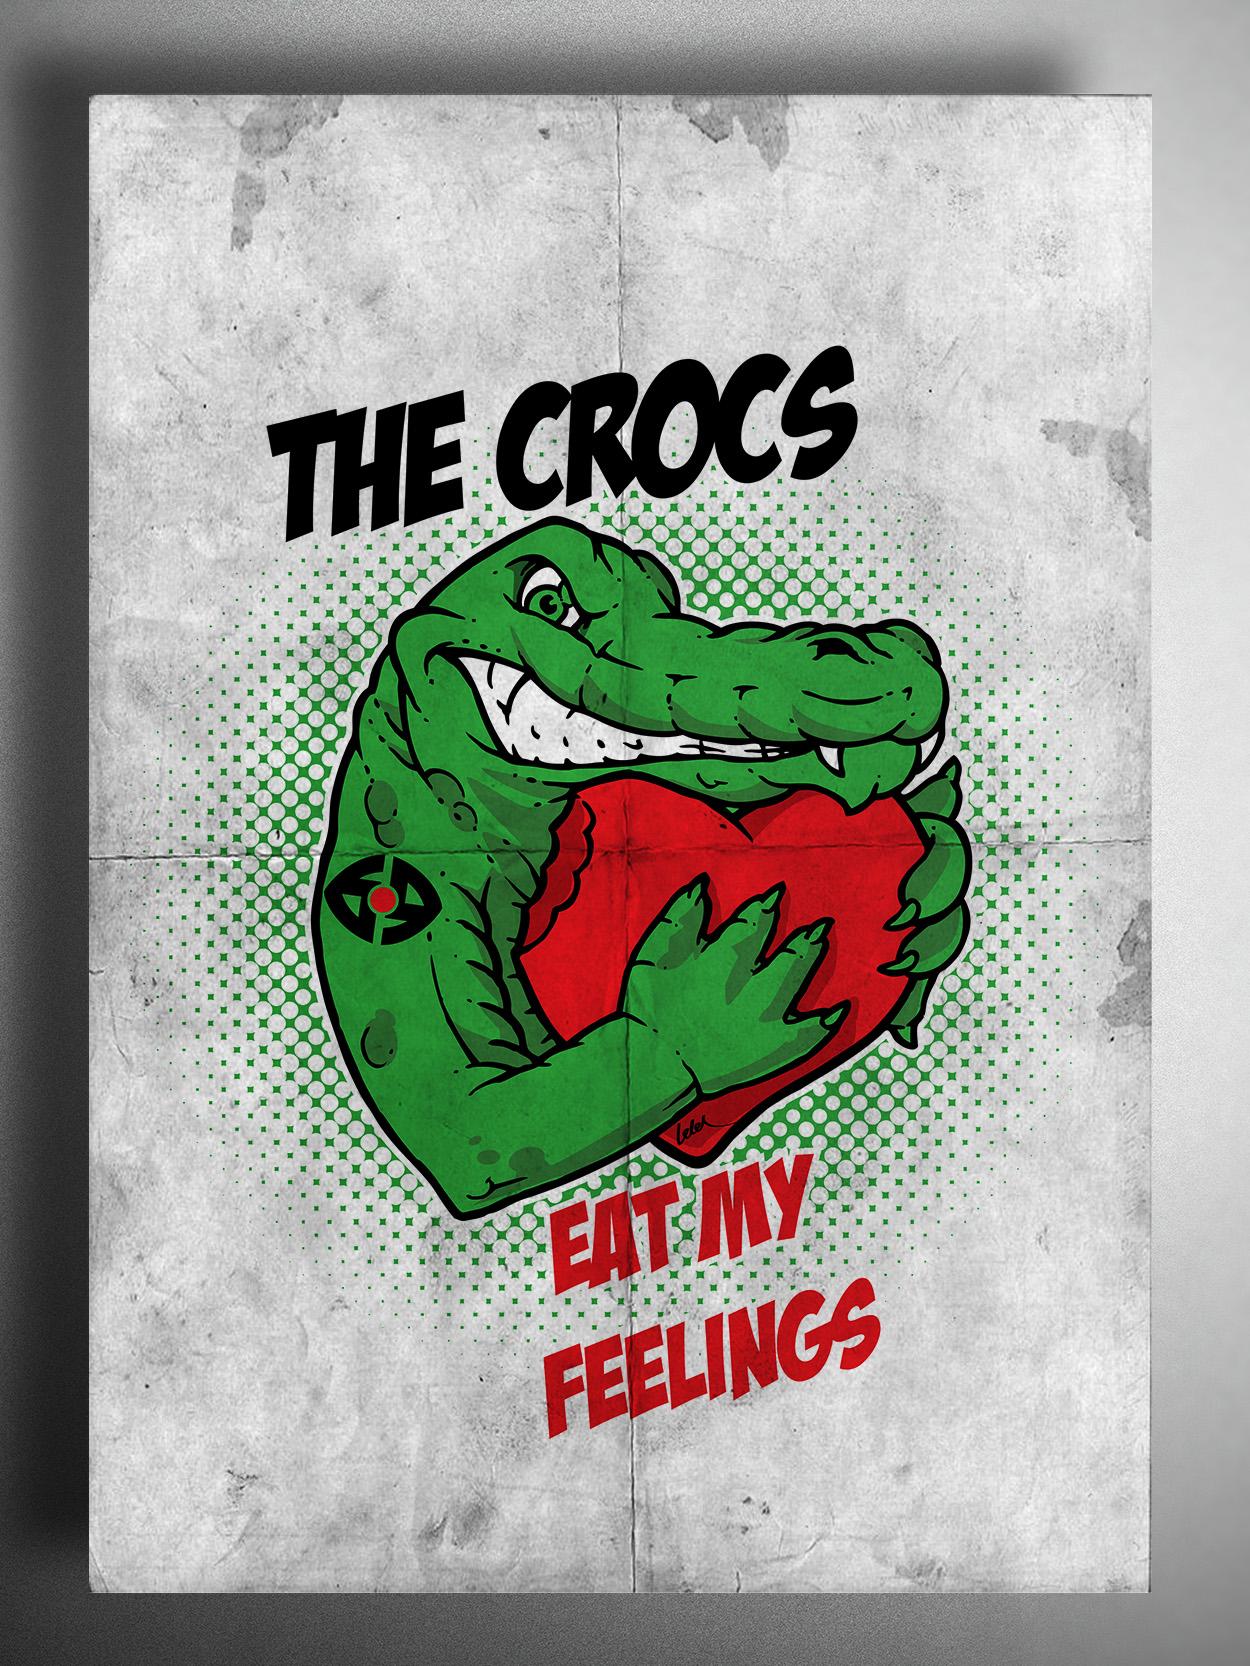 THE_CROKS